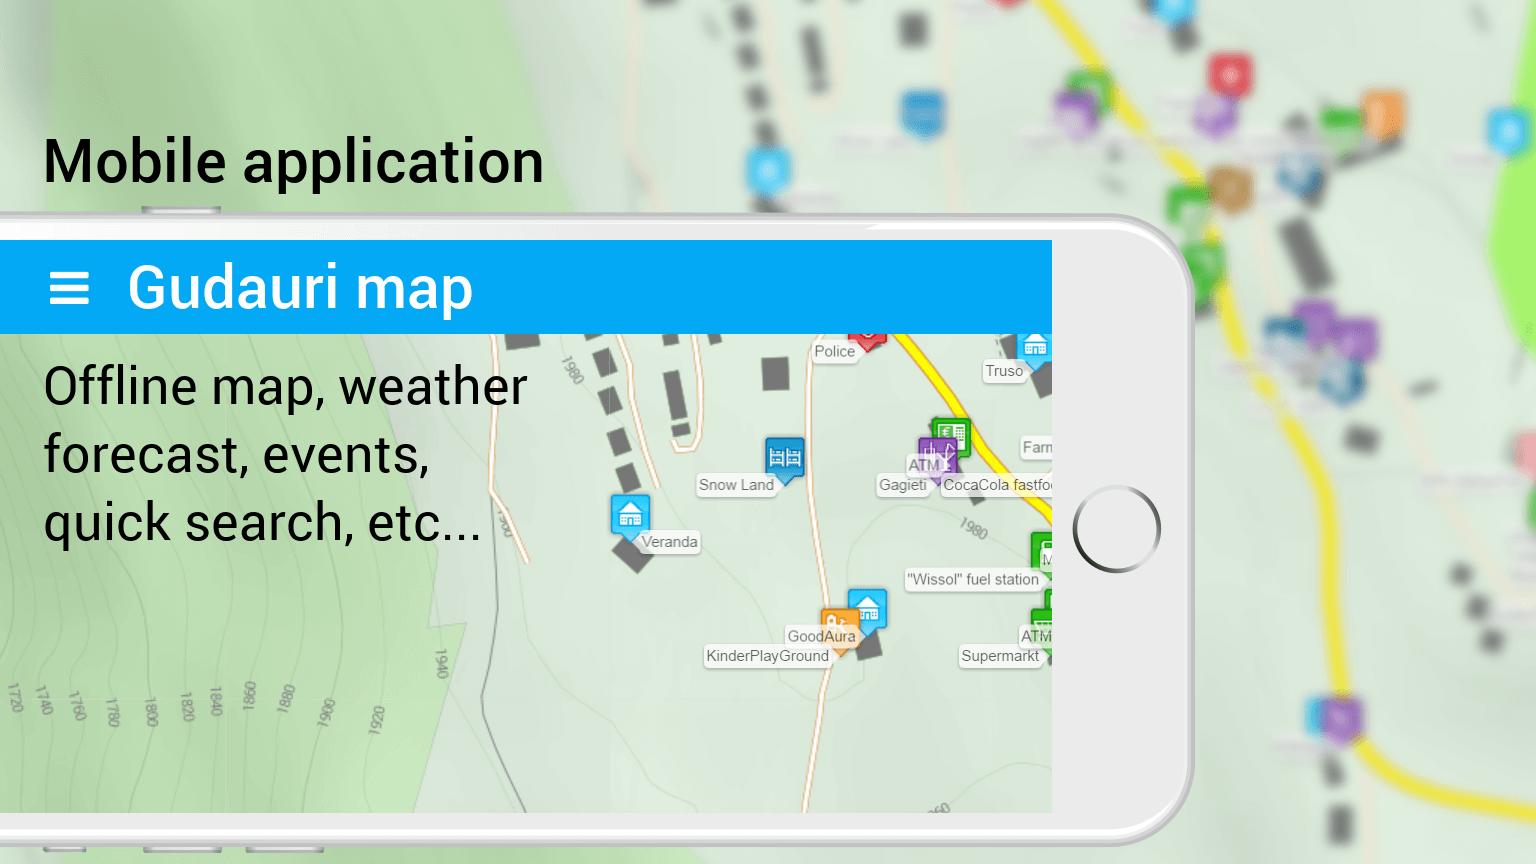 Map Of Georgia Hotels.Gudauri Ski Resort Georgia Hotels Appartments Weather Webcam